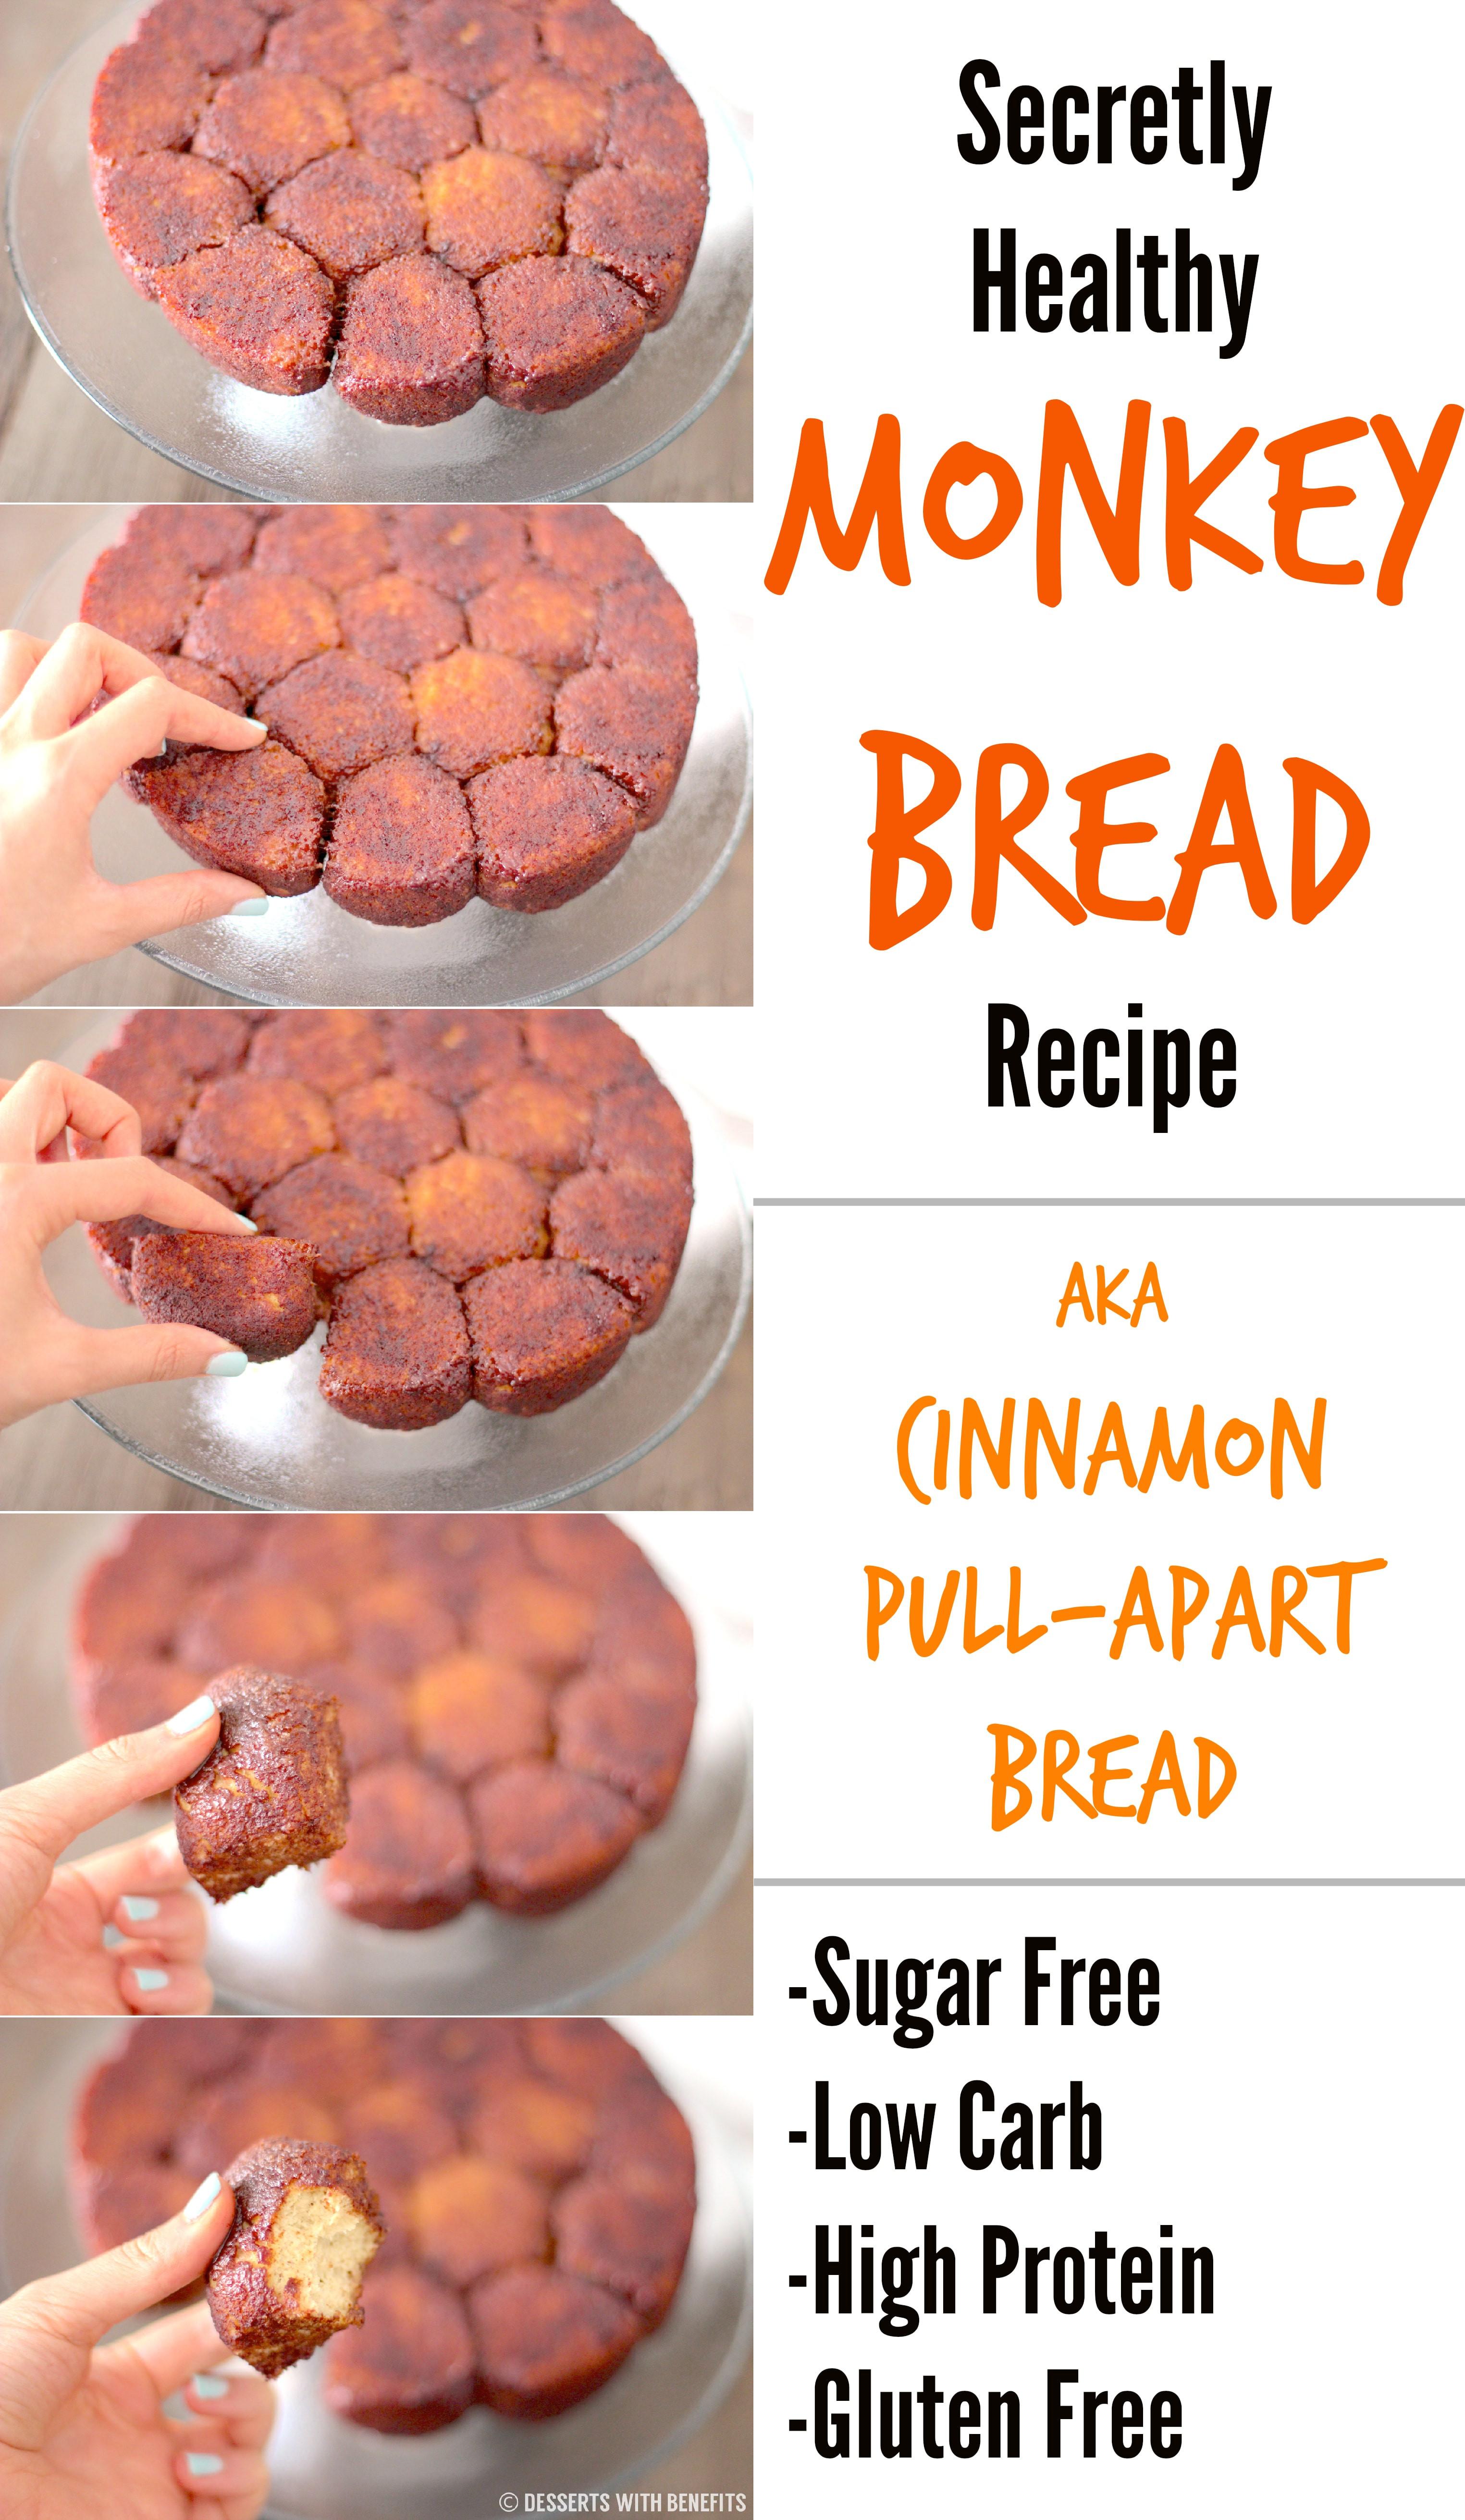 Low Carb High Fiber Recipes  Healthy Gluten Free Monkey Bread Recipe